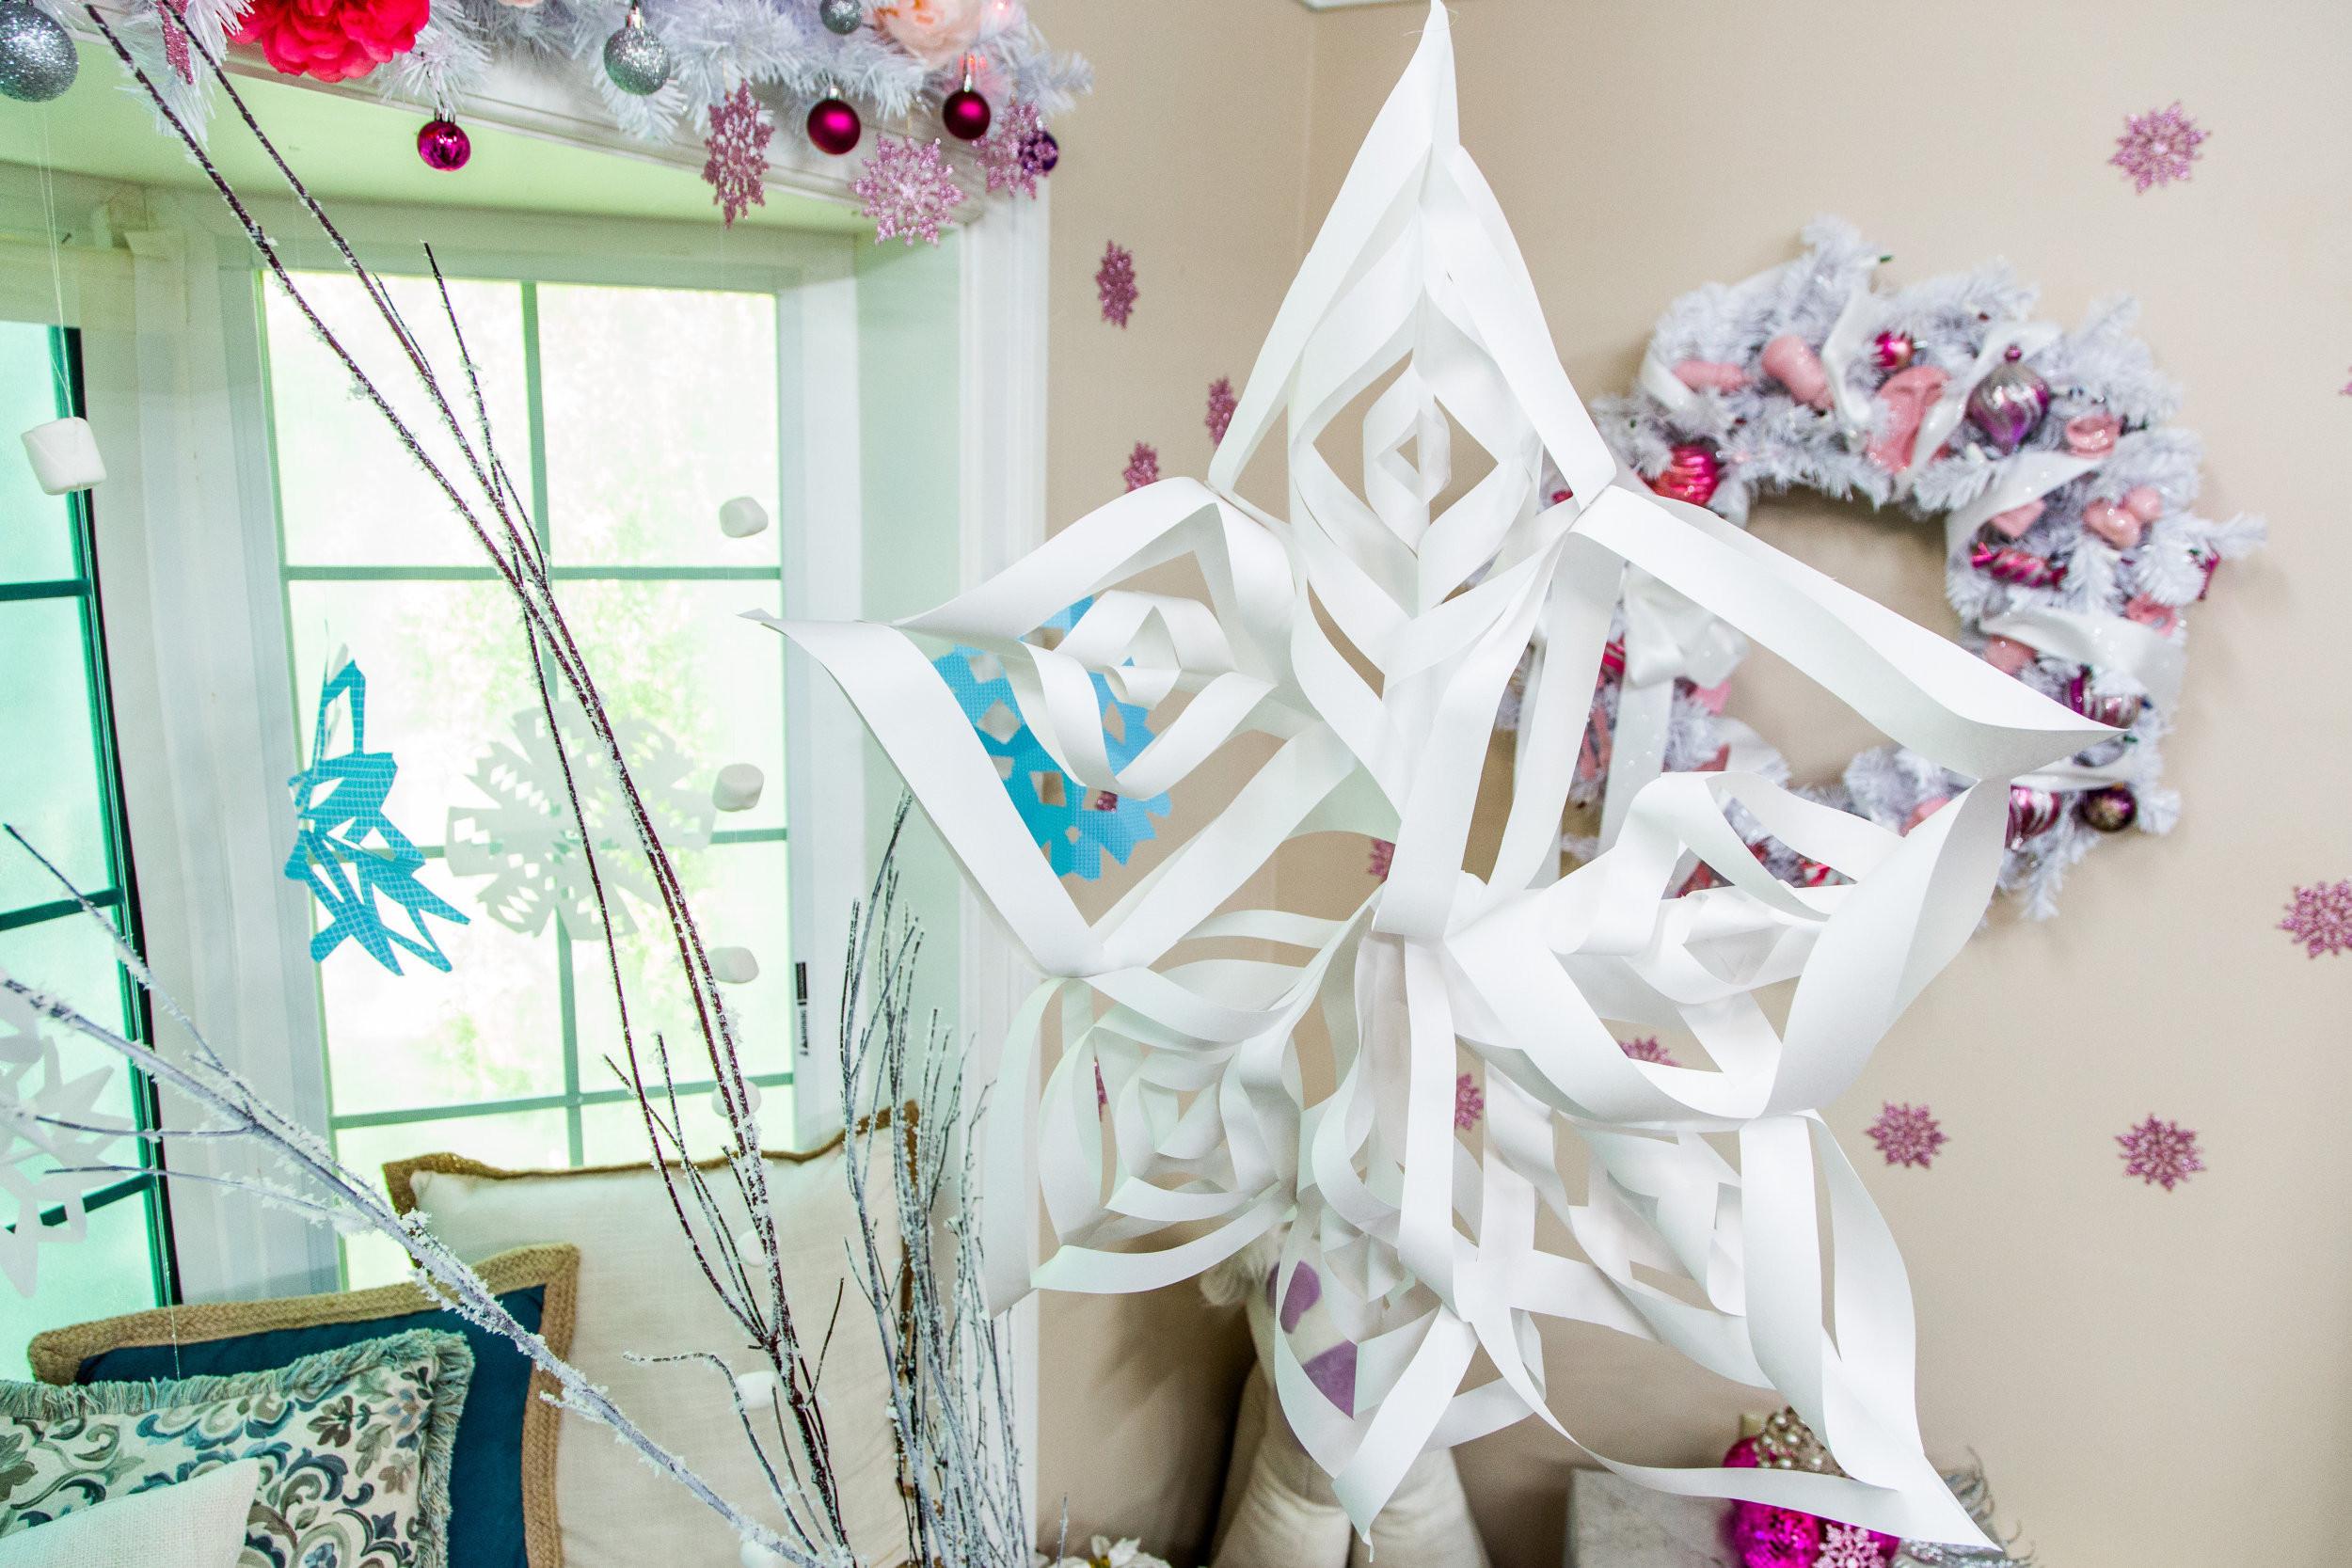 DIY Christmas Photography Backdrop  How To Tanya's DIY Christmas Wonderland Backdrop